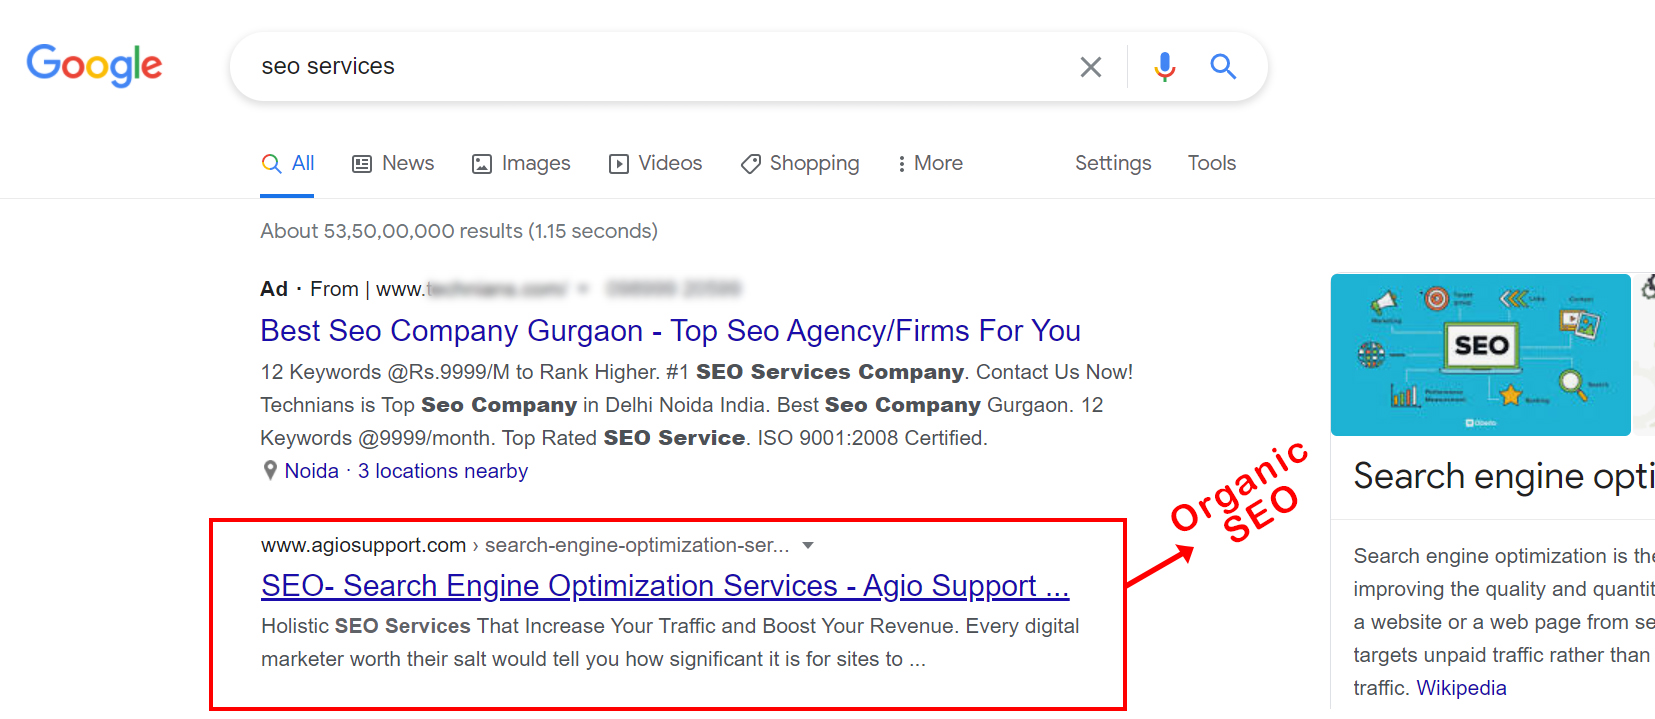 types of digital marketing - SEO (Search Engine Optimization)